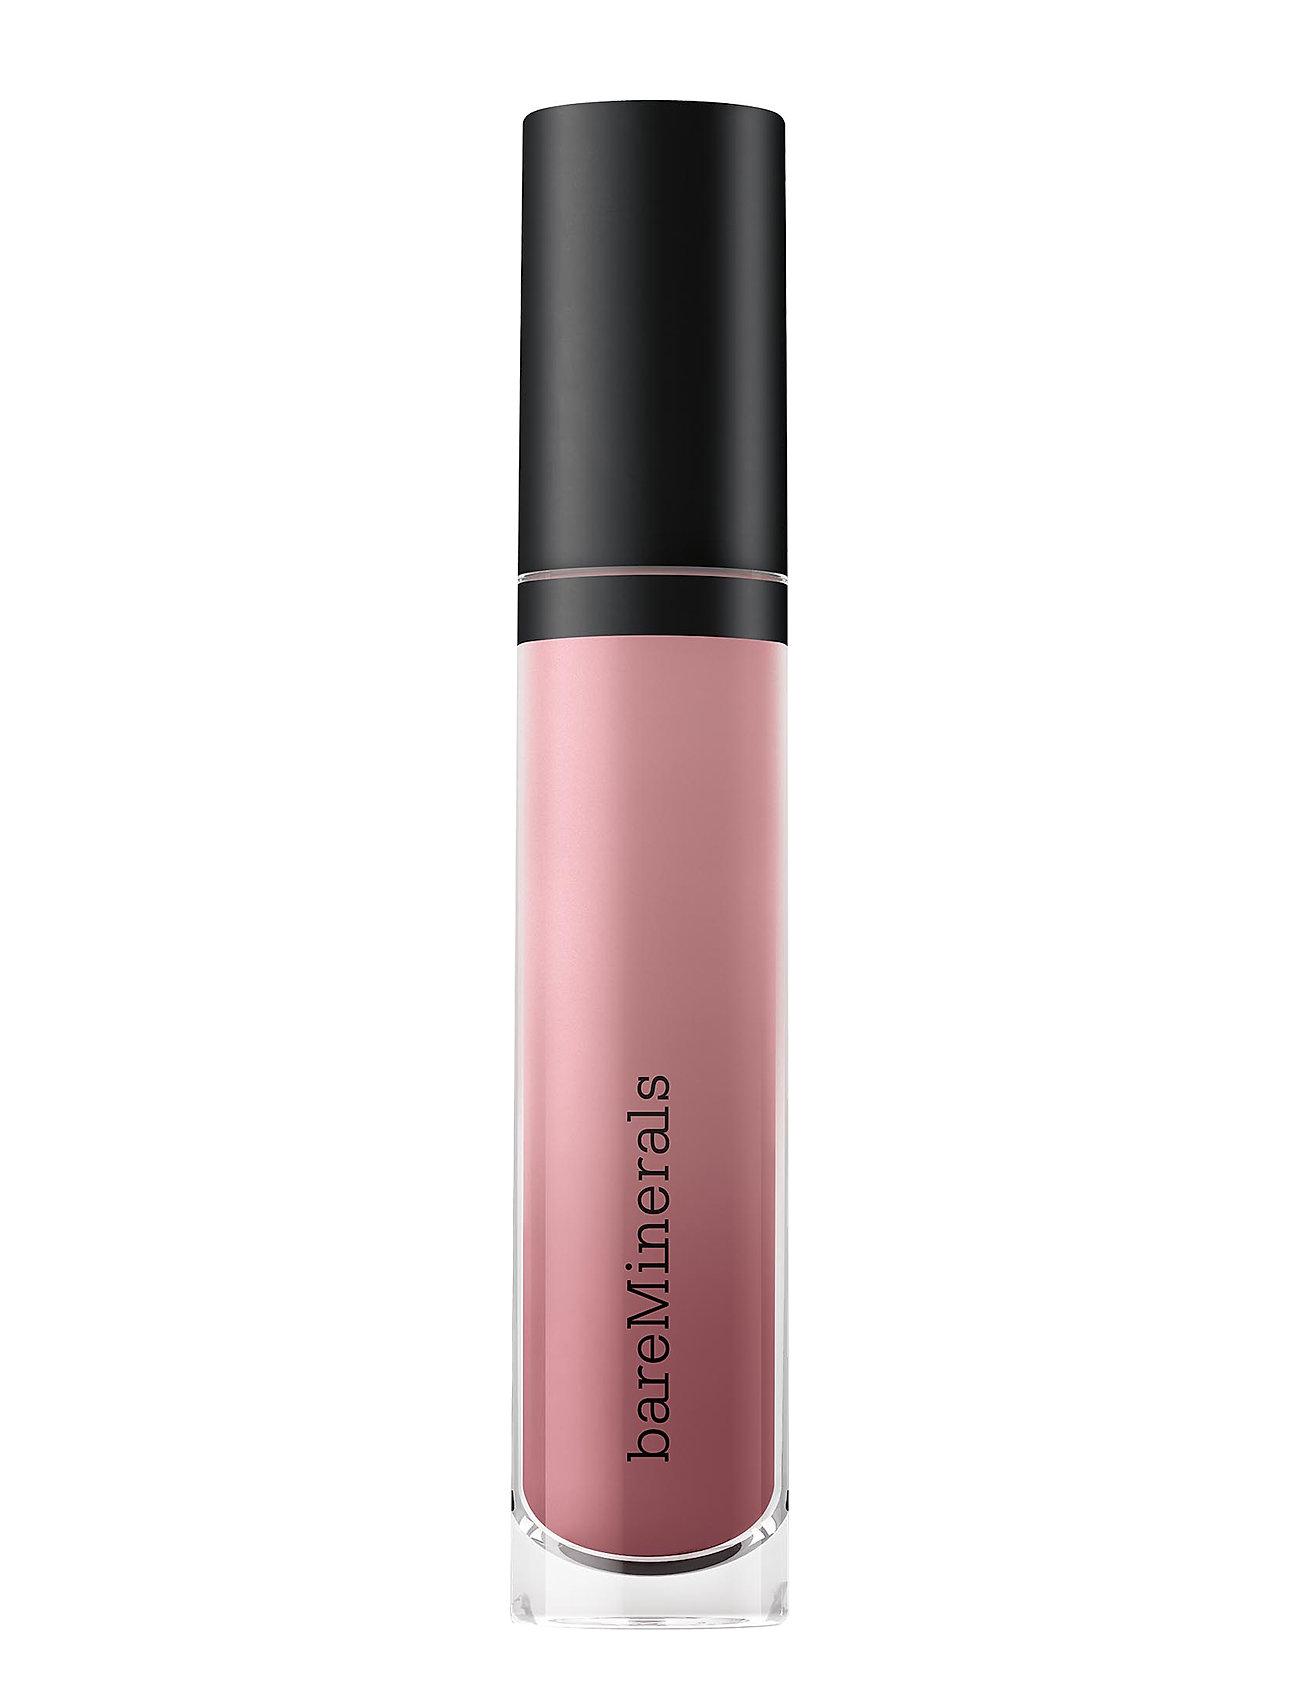 Image of Statement Matte Liquid Lipcolor Lipgloss Makeup Lilla BareMinerals (3123265369)